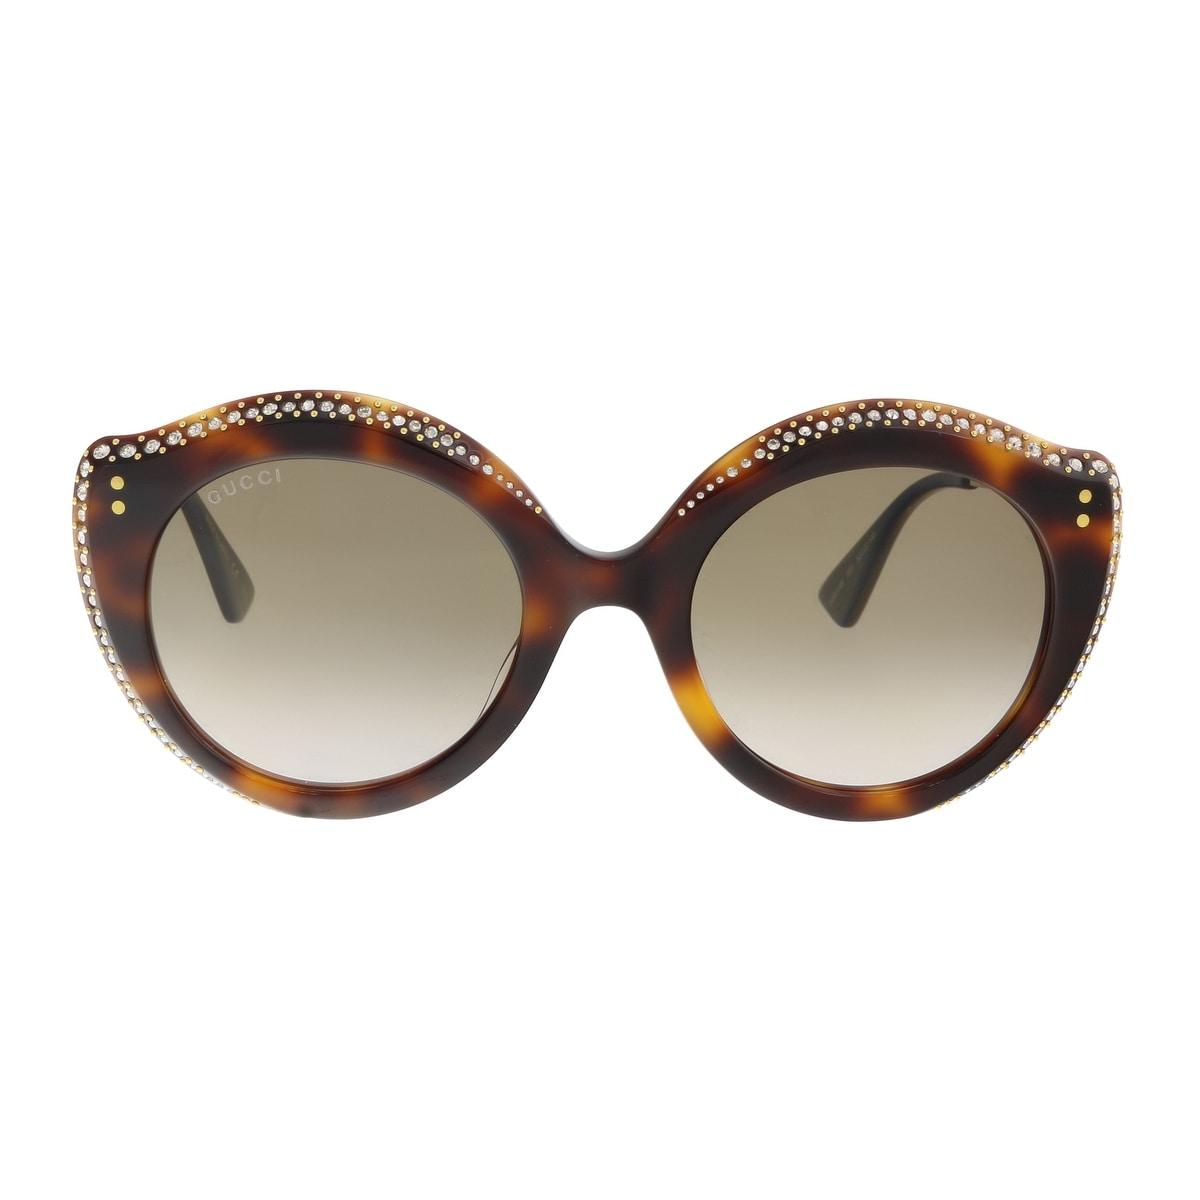 3c72f1ba42 Shop Gucci GG0214S-003 Havana Cat Eye Sunglasses - 52-22-145 - Free  Shipping Today - Overstock - 19490360